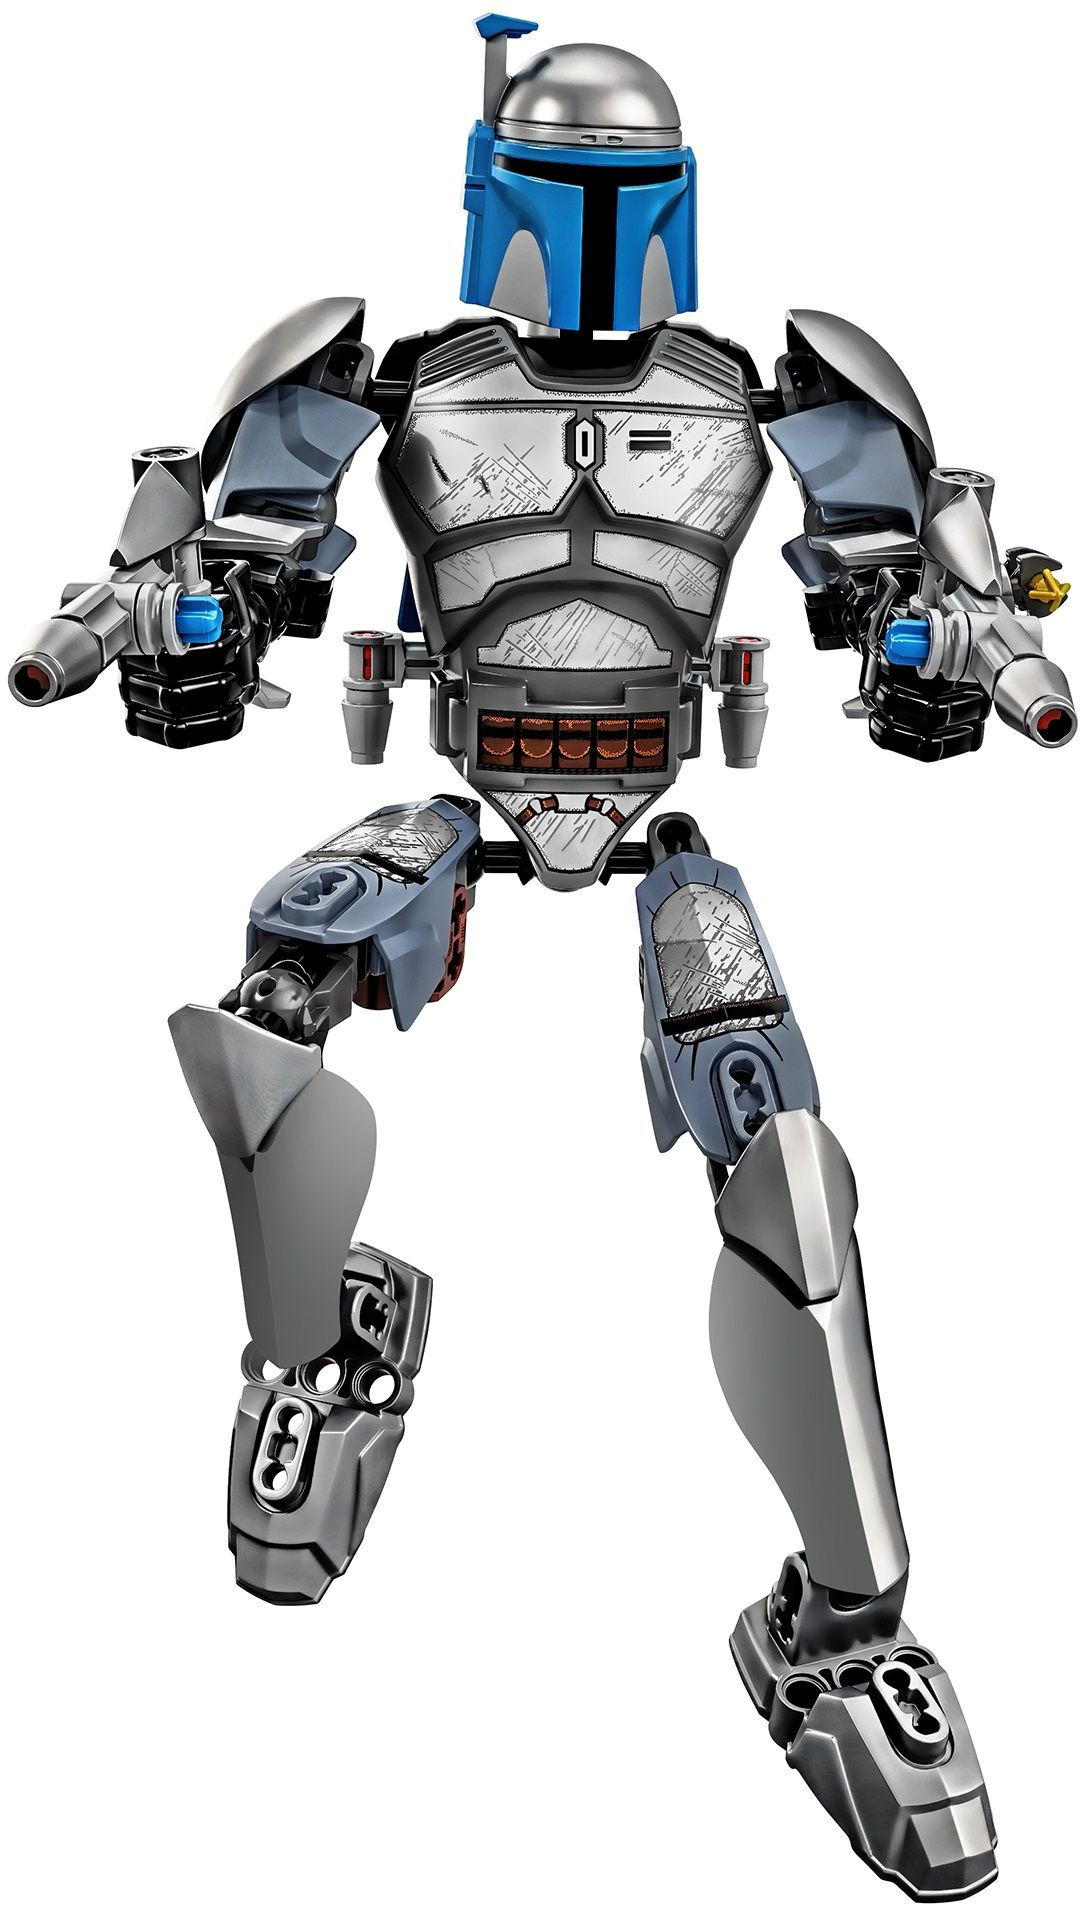 Upcoming lego star wars the force awakens 2015 sets geek - Image star wars lego ...